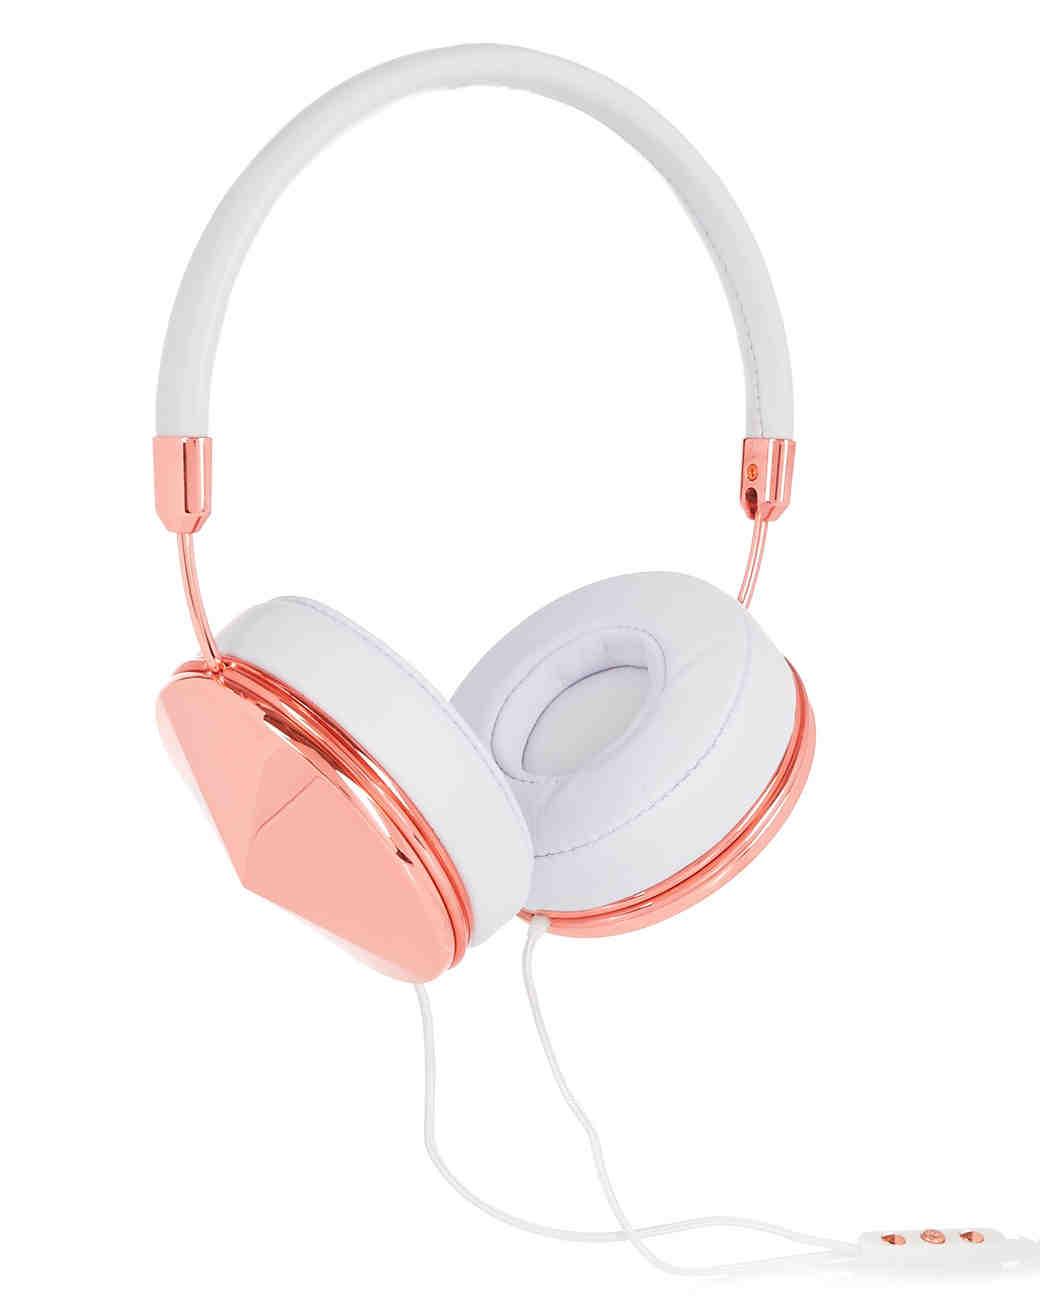 unexpected-bridal-shower-gifts-headphones-net-a-porter-1115.jpg